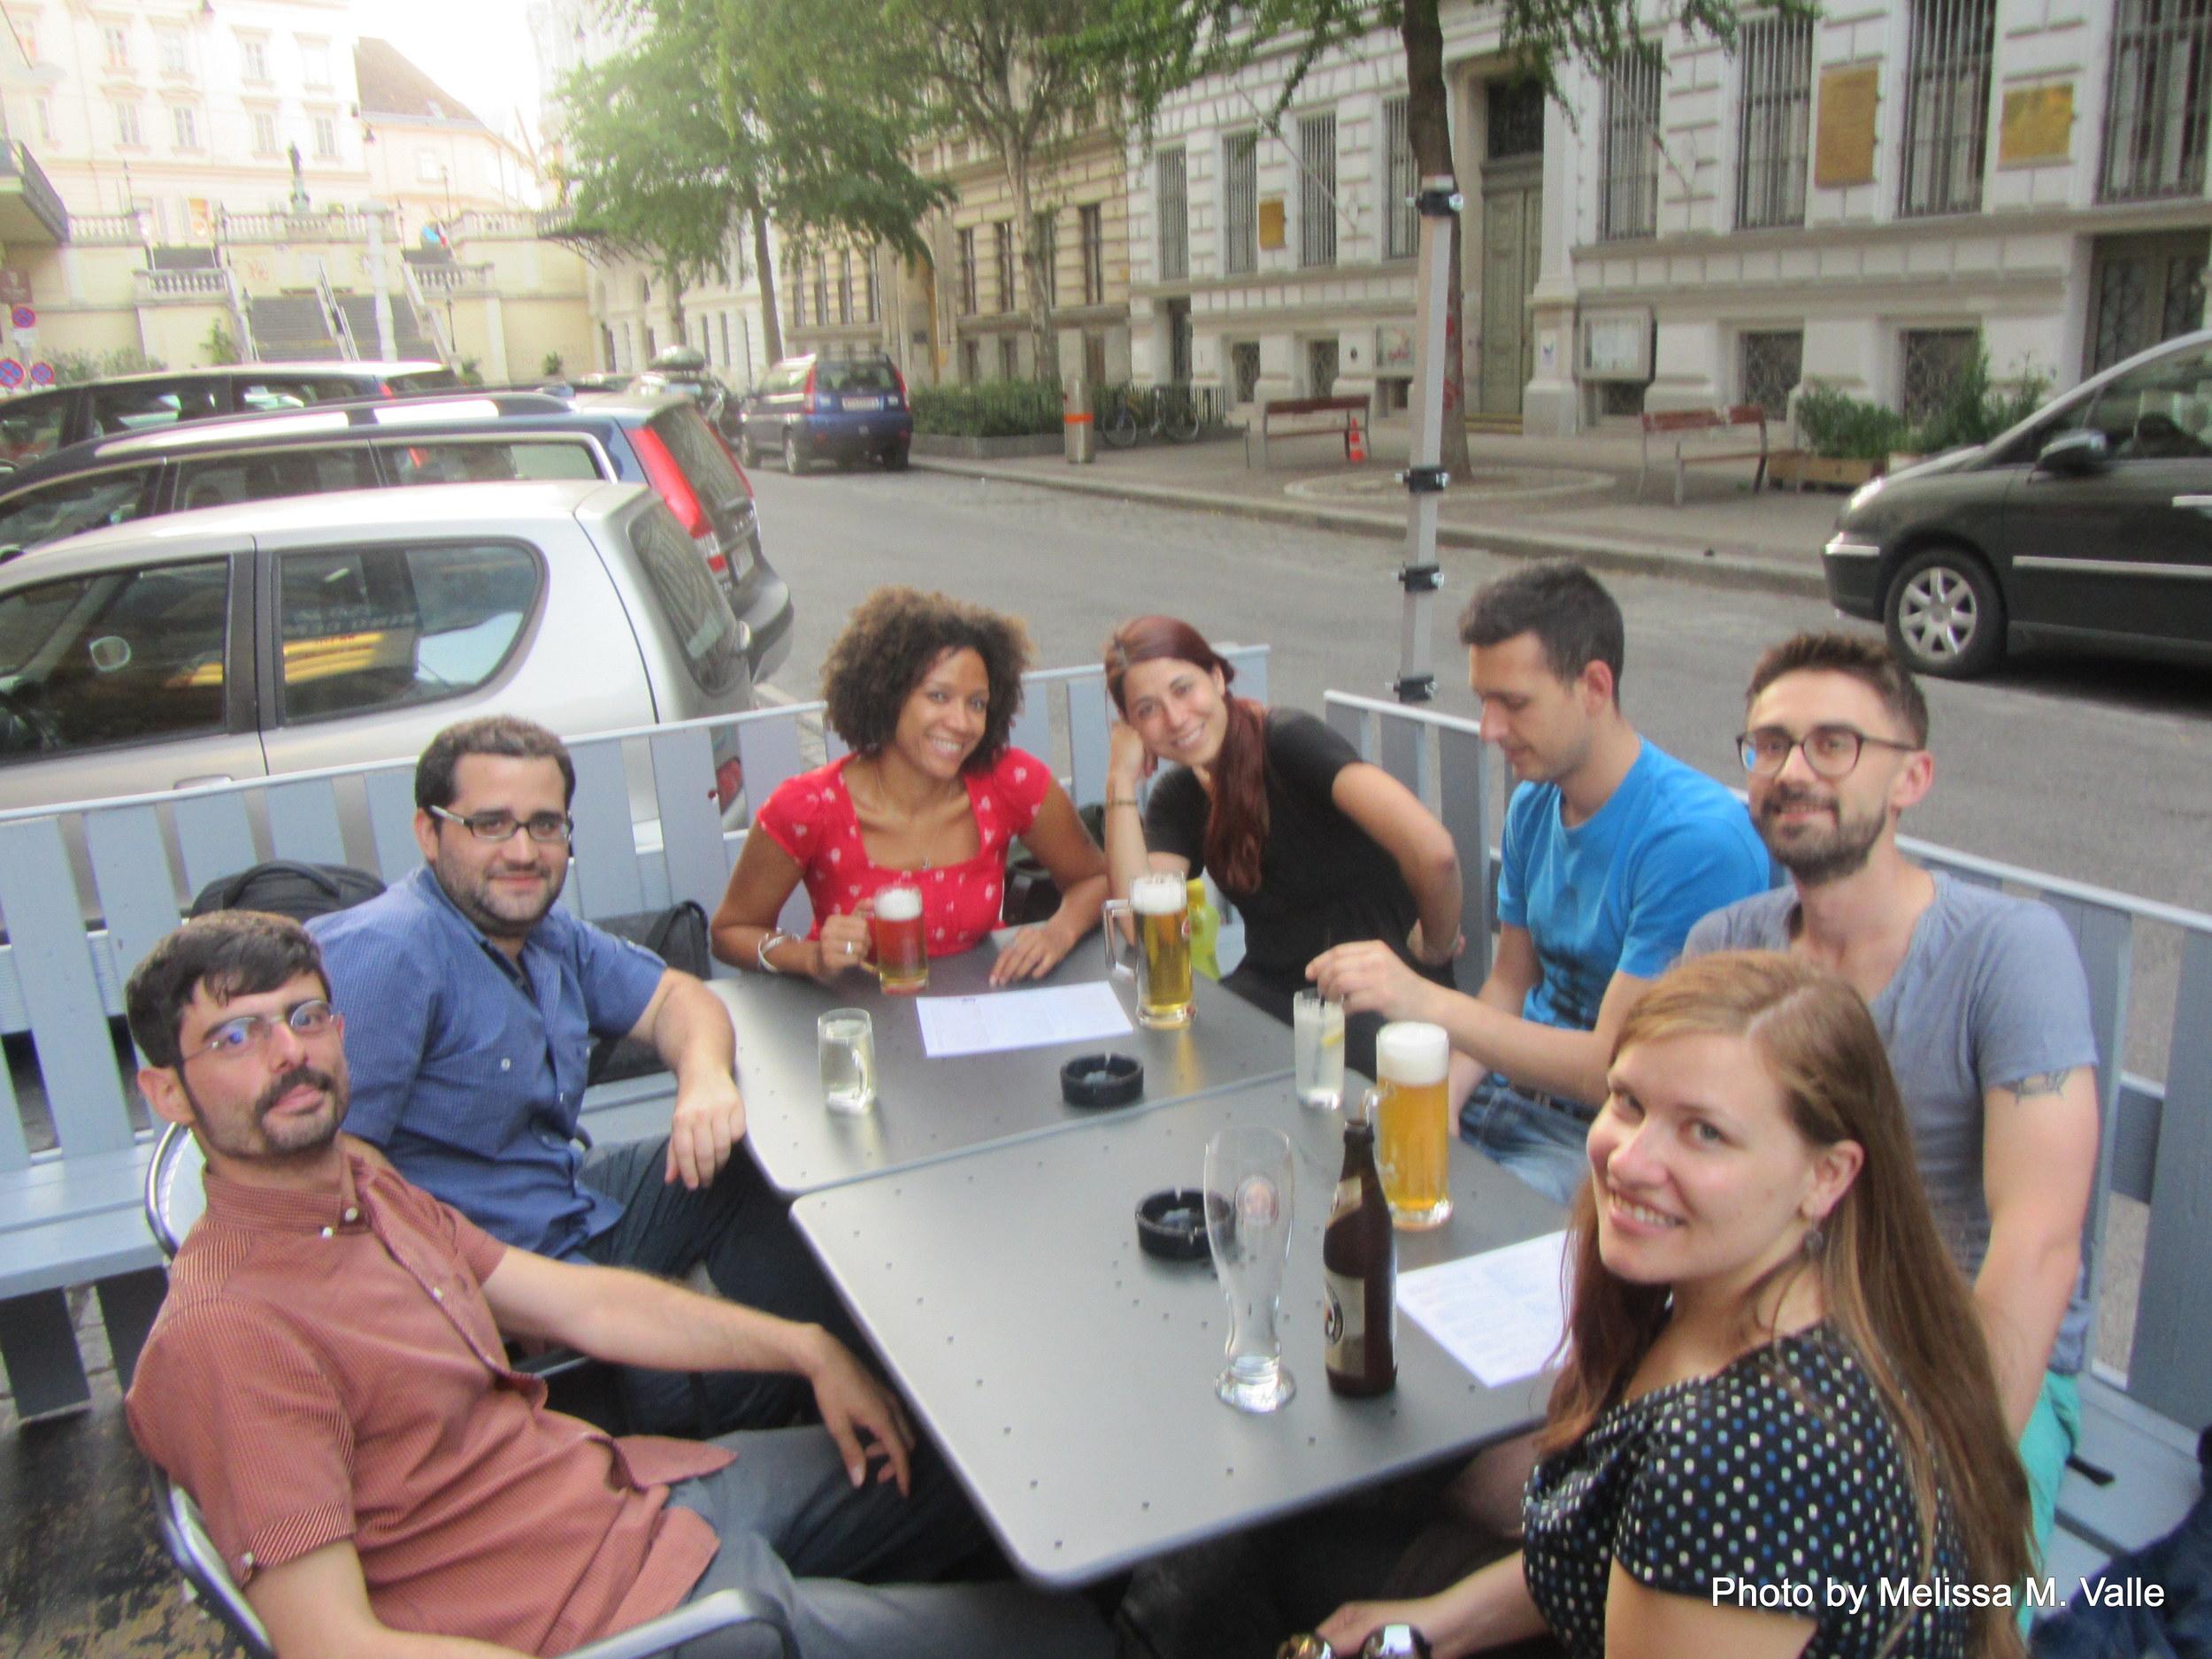 7.6.14 Vienna, Austria- post city exploration chill with Pano, Dimitri, Stefanioa, friend, Andreas and Samantha (2).JPG